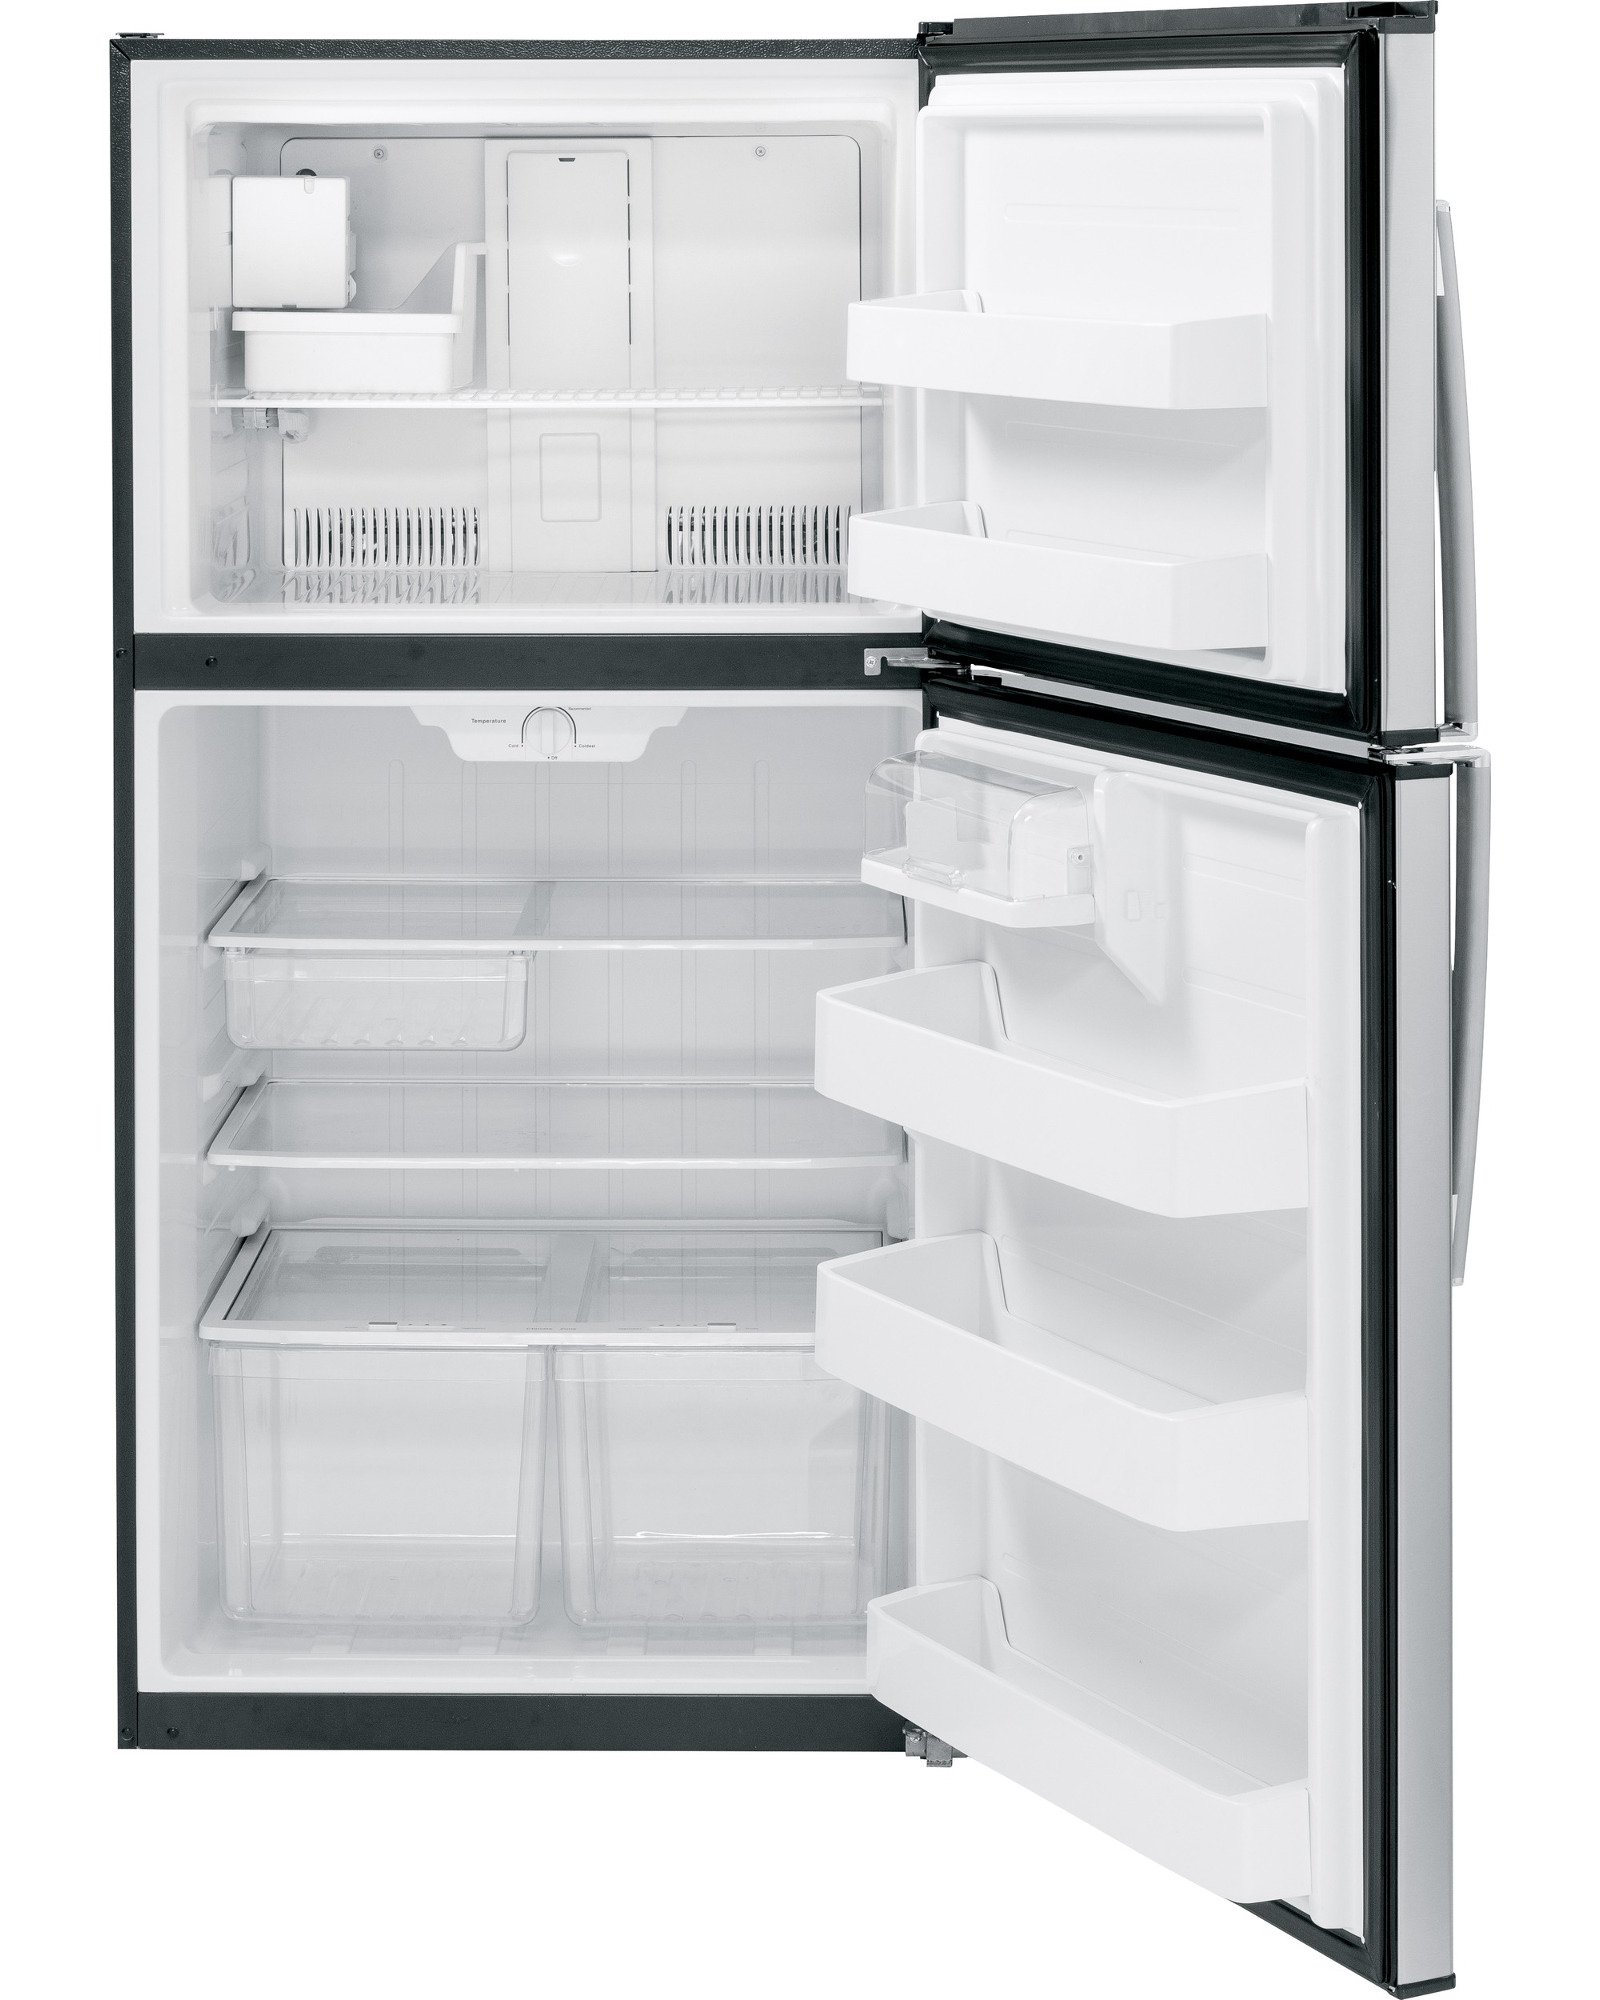 GE Appliances 21.2 cu. ft. Top-Freezer Refrigerator - Stainless Steel